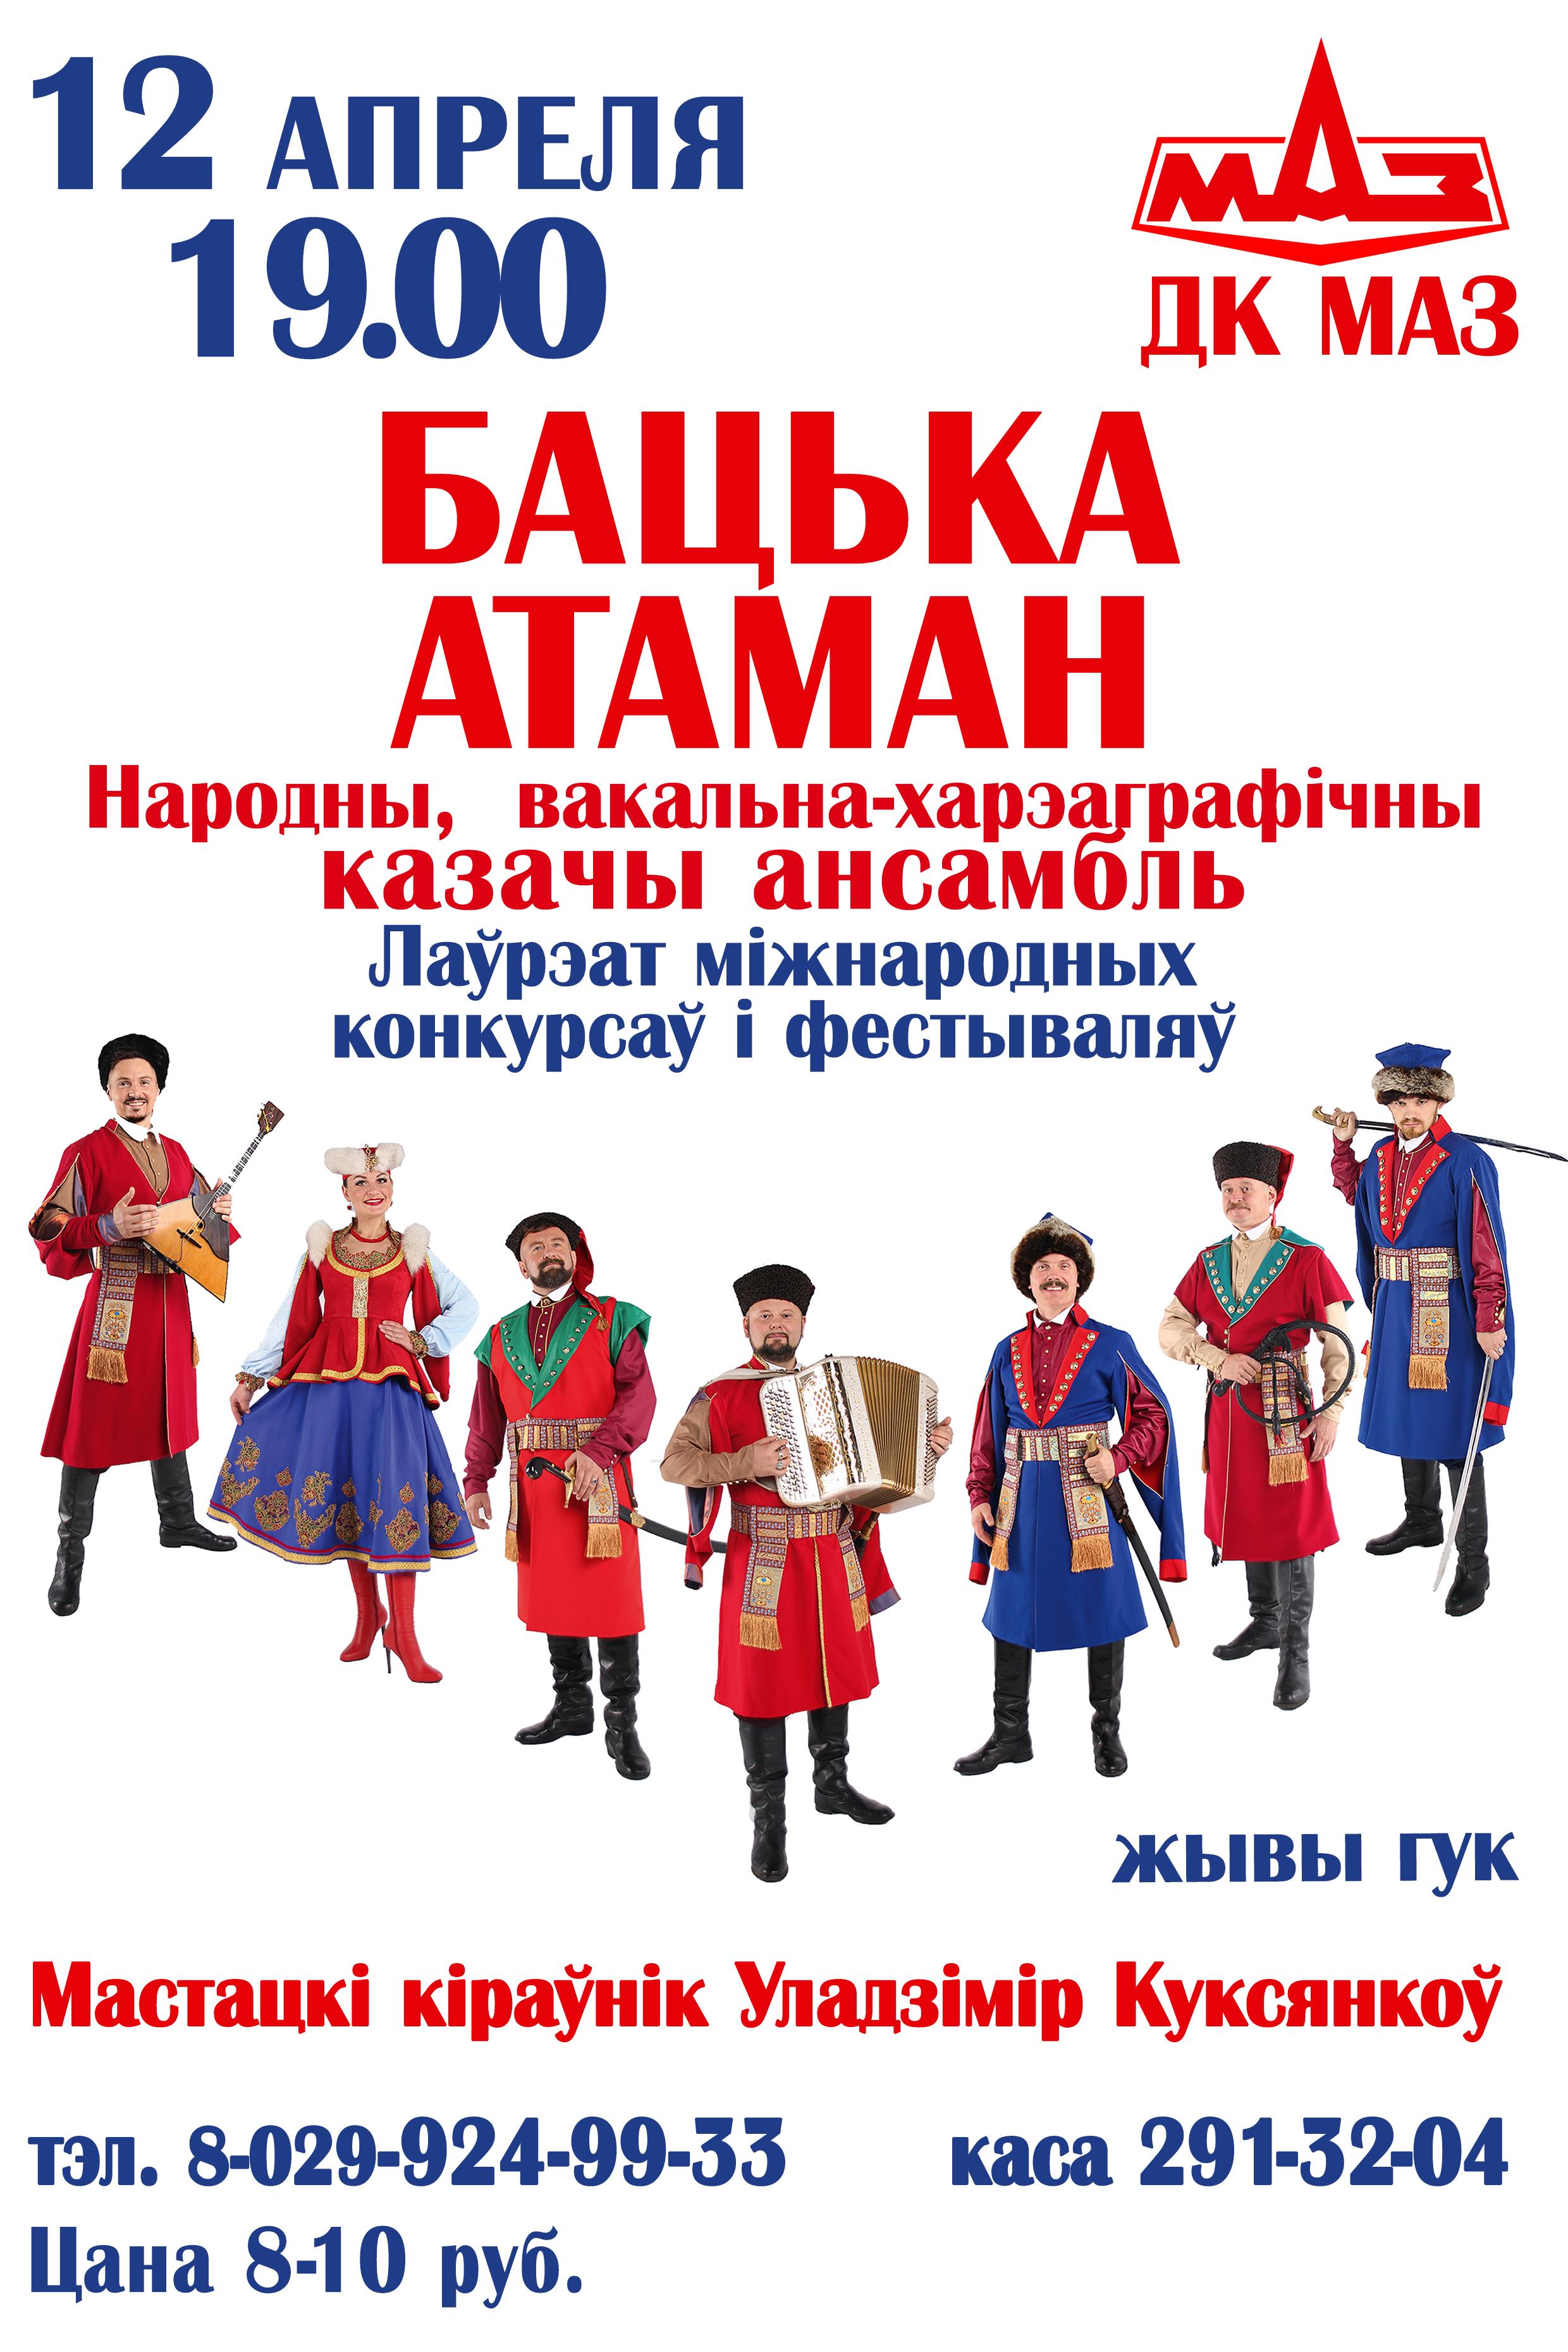 БА Афиша ДК МАЗ